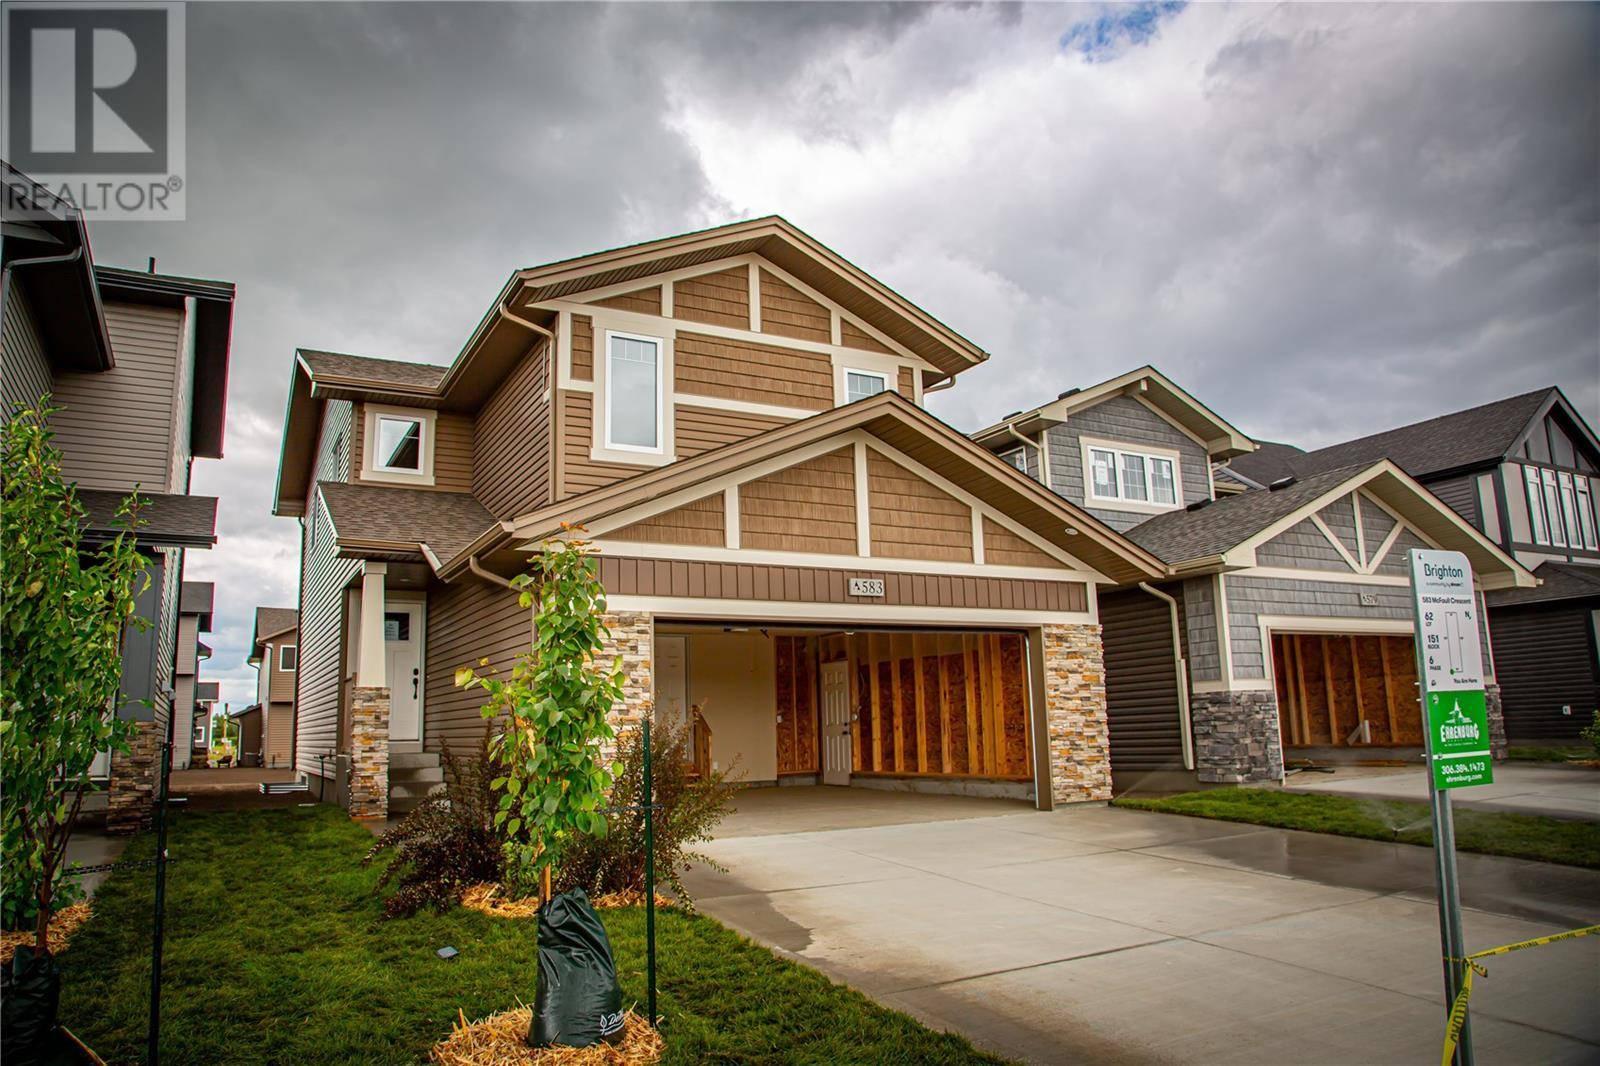 House for sale at 583 Mcfaull Cres Saskatoon Saskatchewan - MLS: SK772004